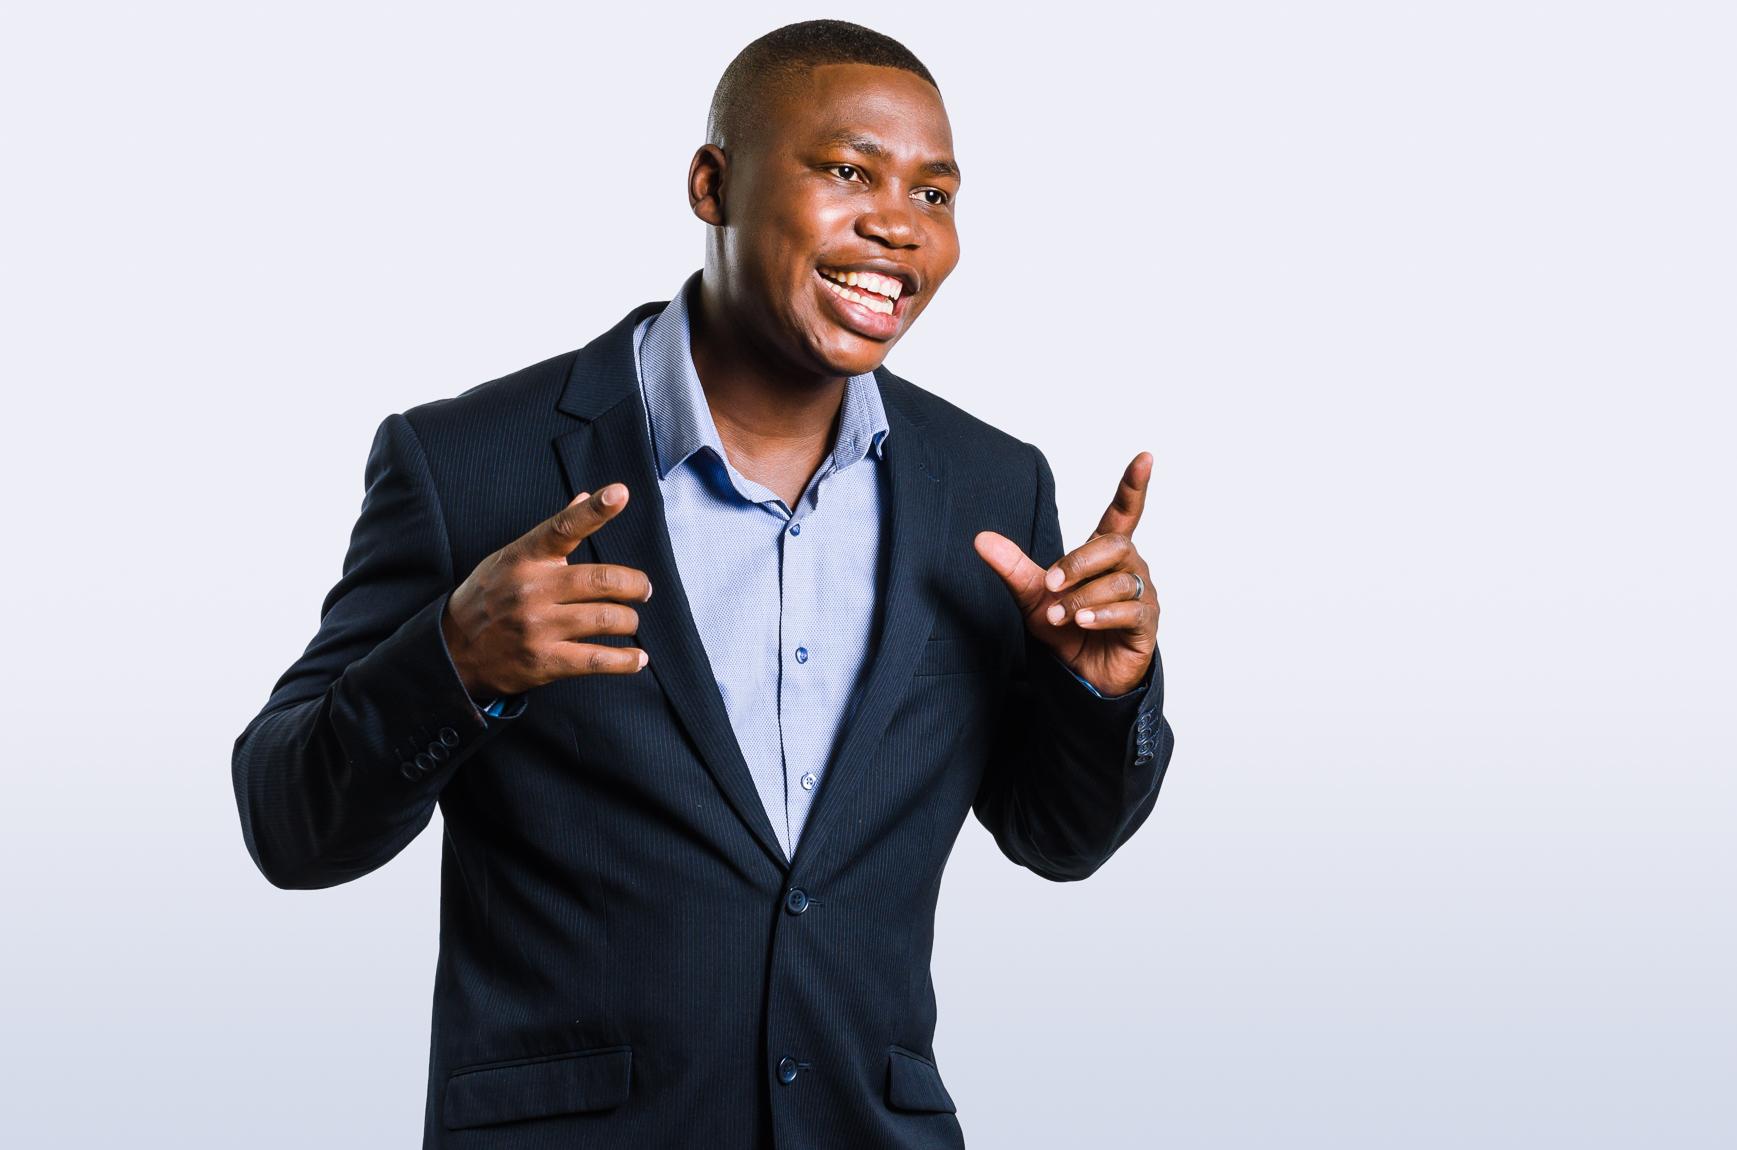 Buhle Dlamini Motivational speaker 2